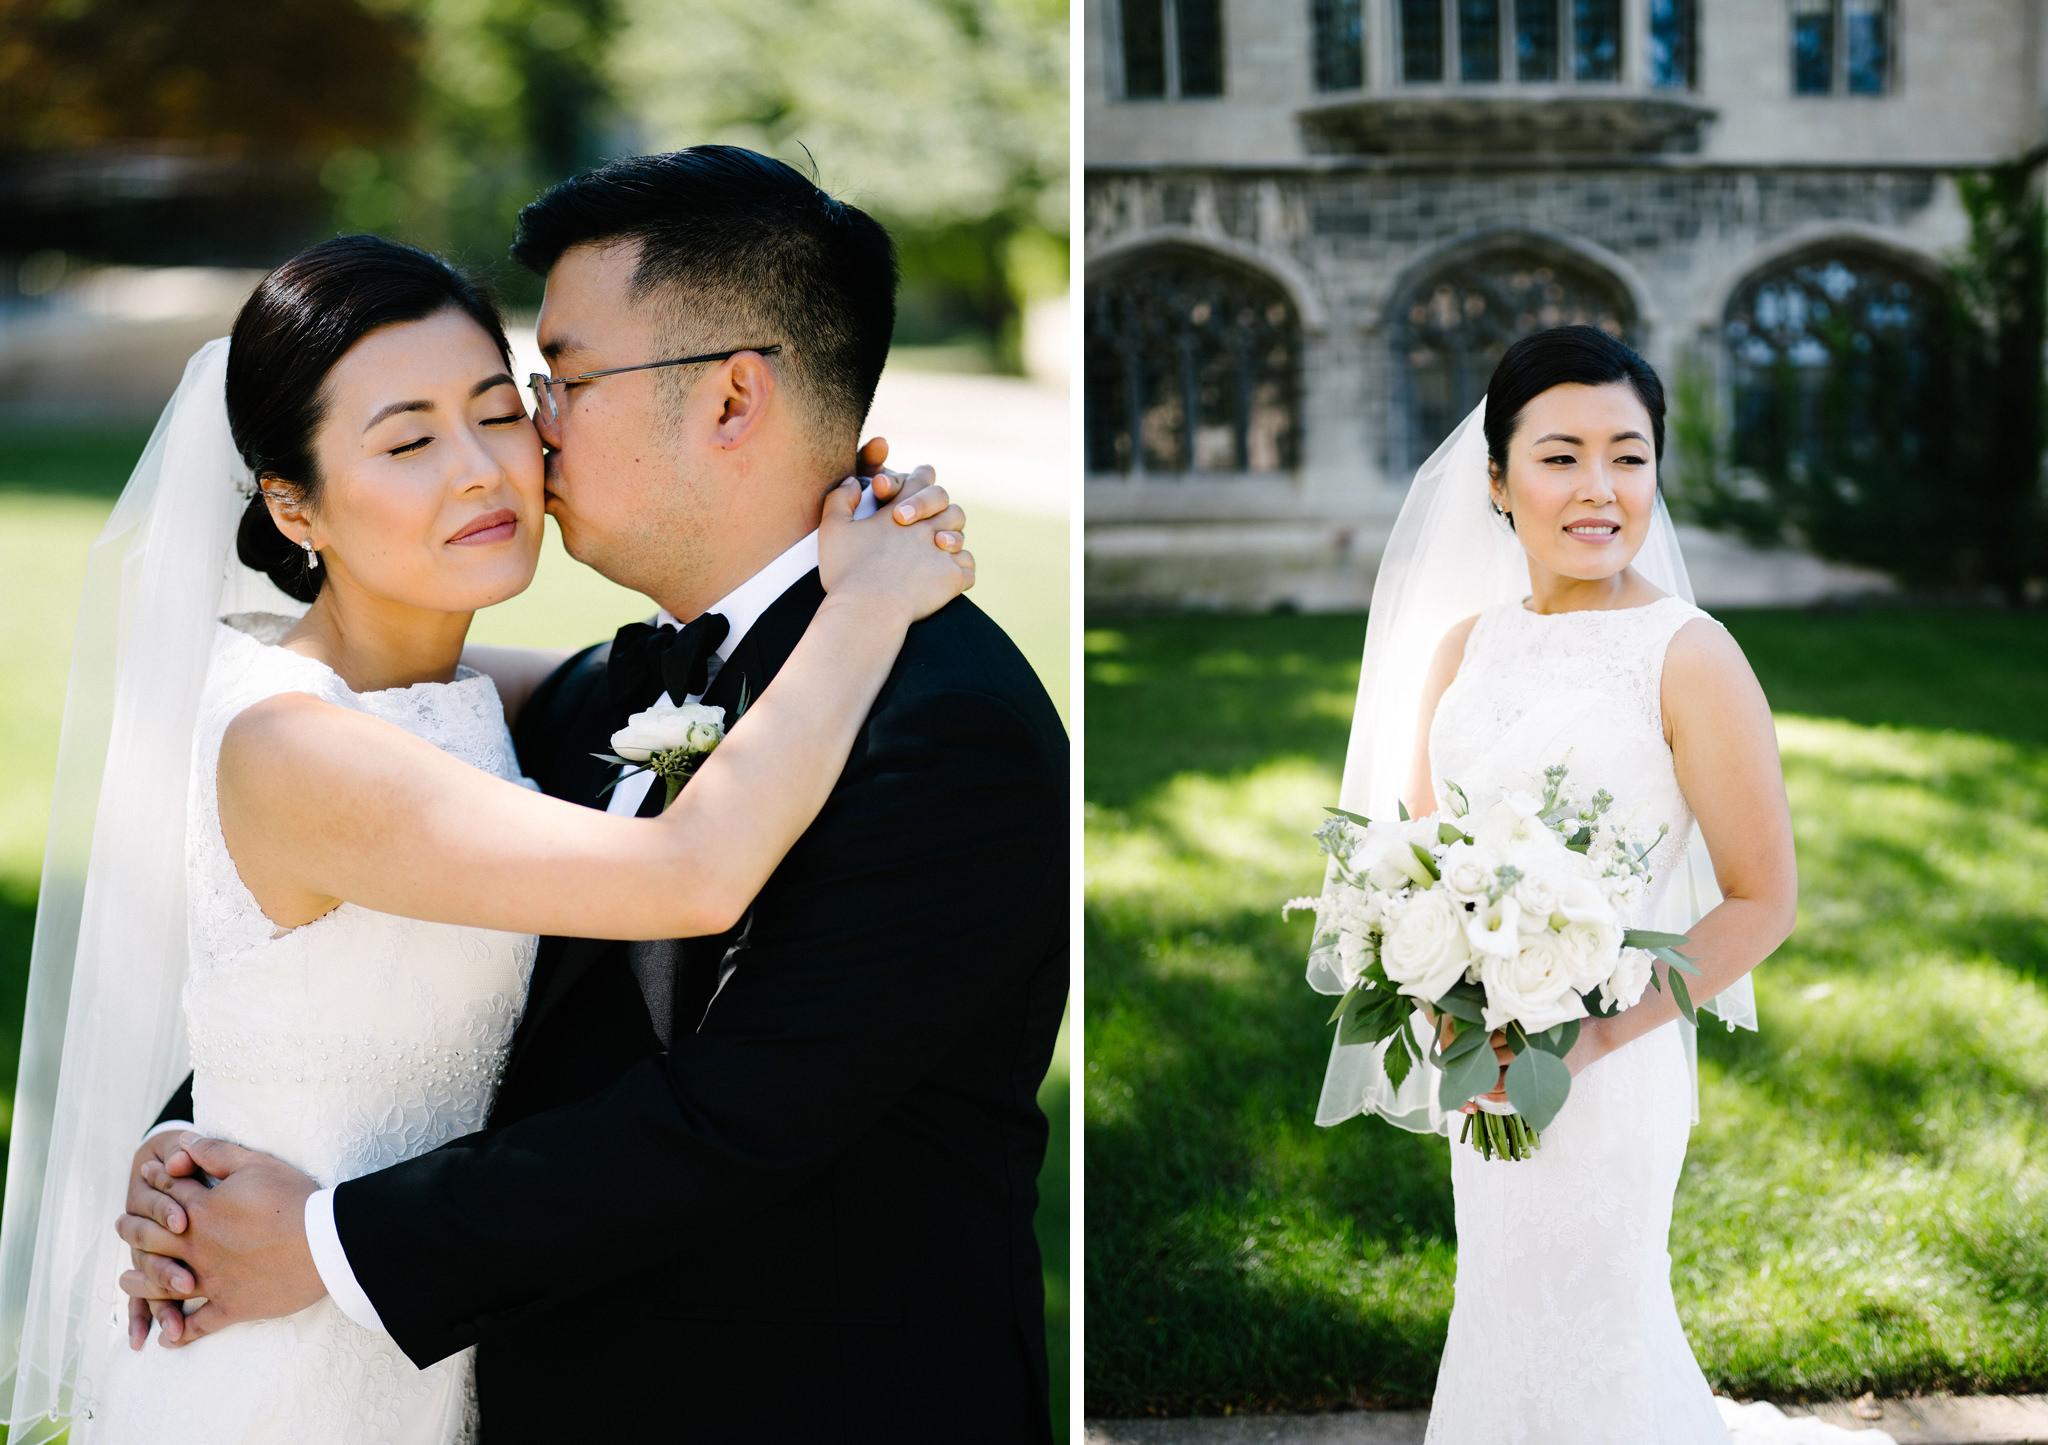 016-rempel-photography-chicago-wedding-inspiration-sara-philip-rockefeller-chapel-trump-tower.jpg